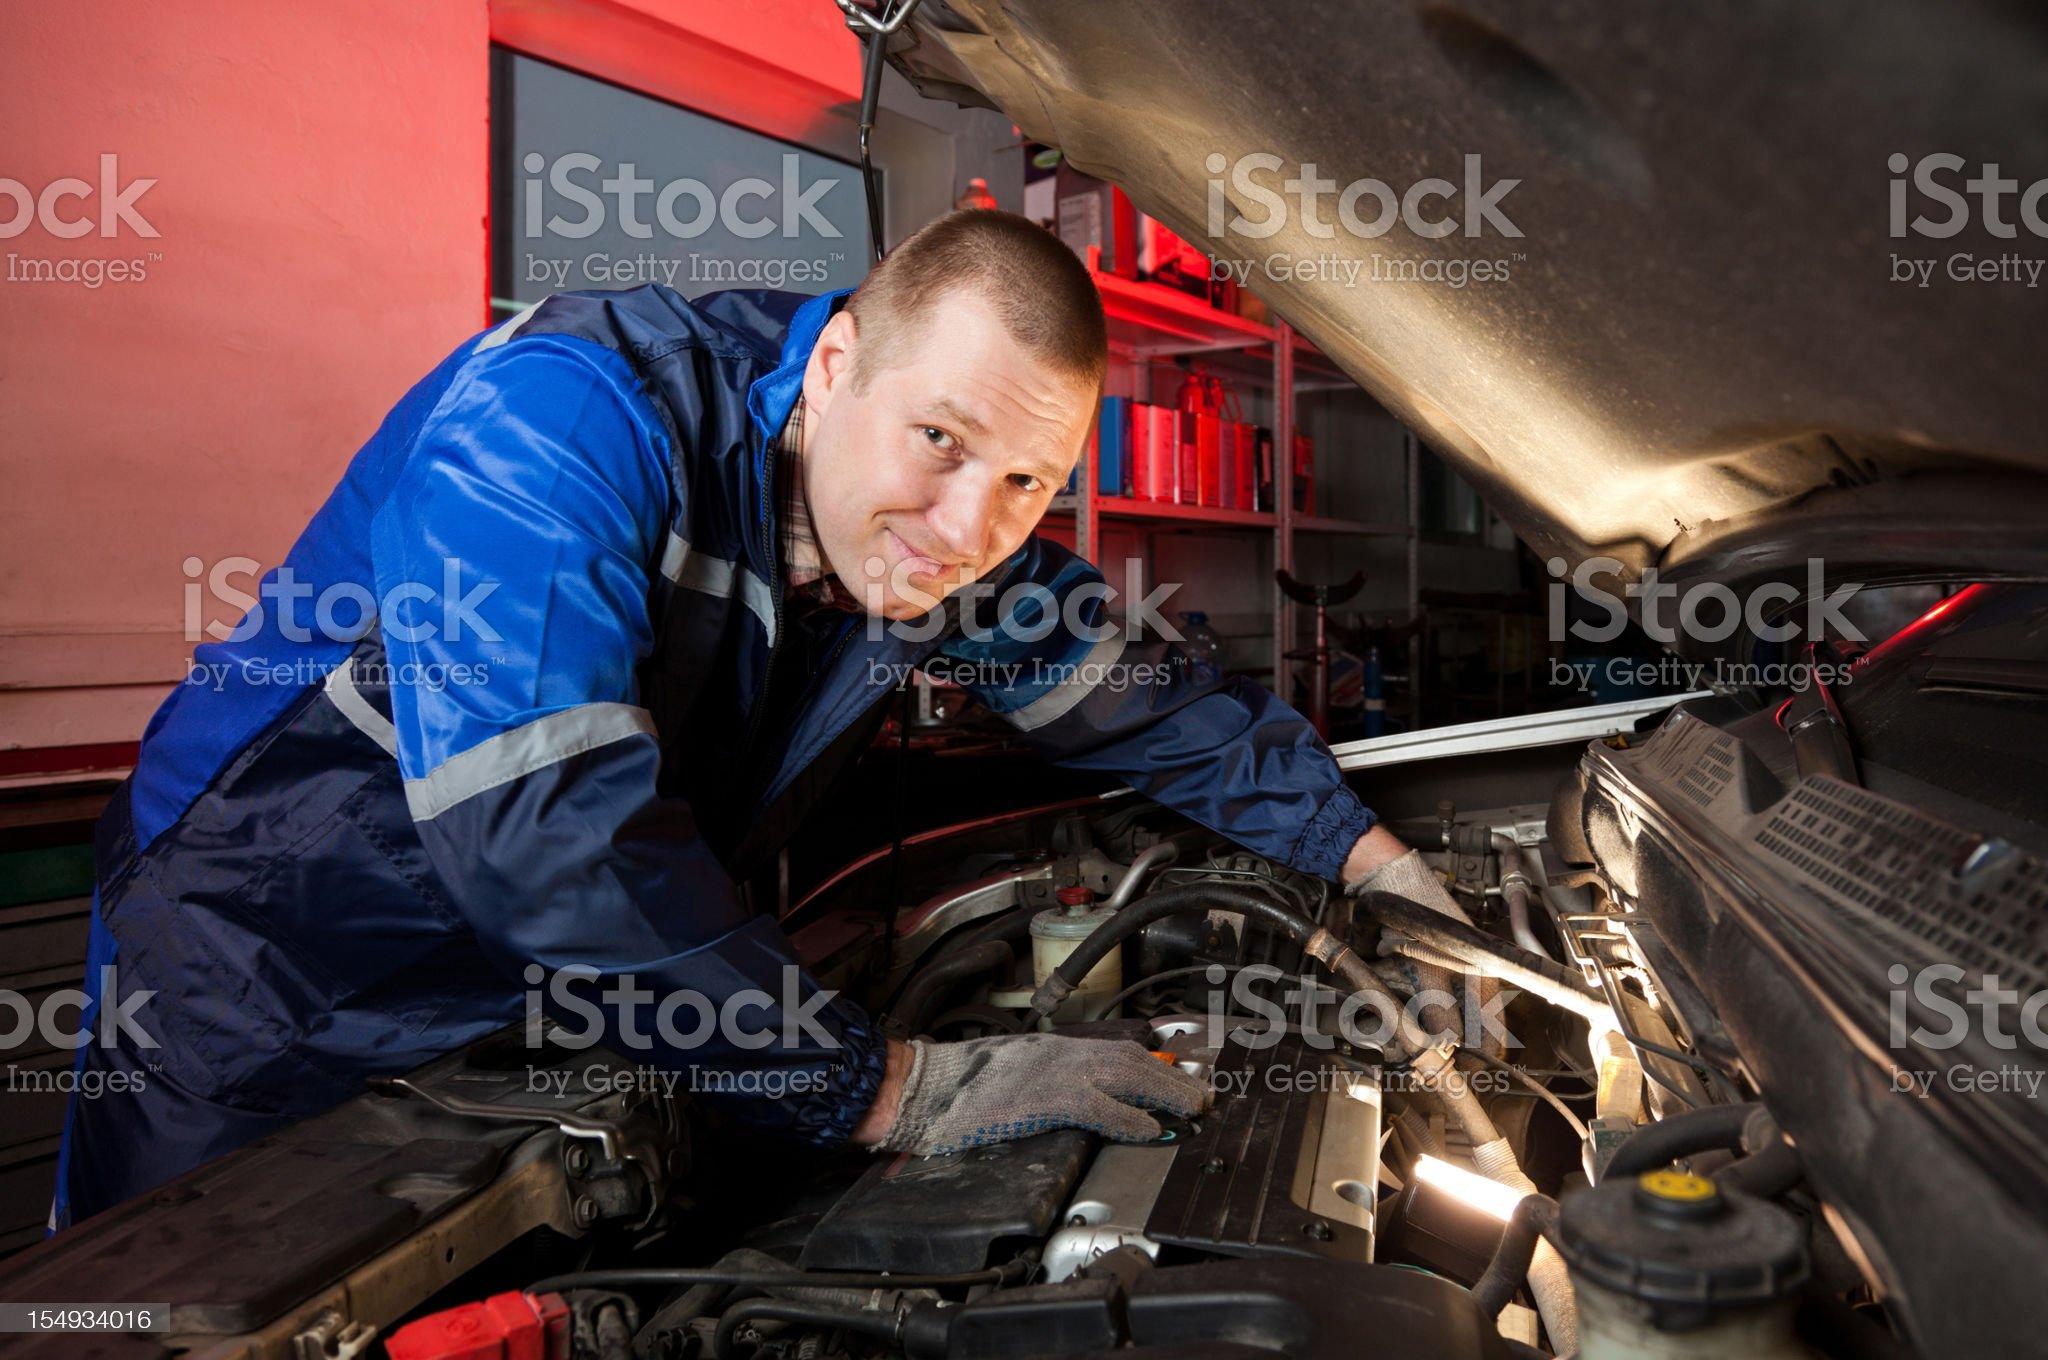 Mechanic checking engine under the hood royalty-free stock photo